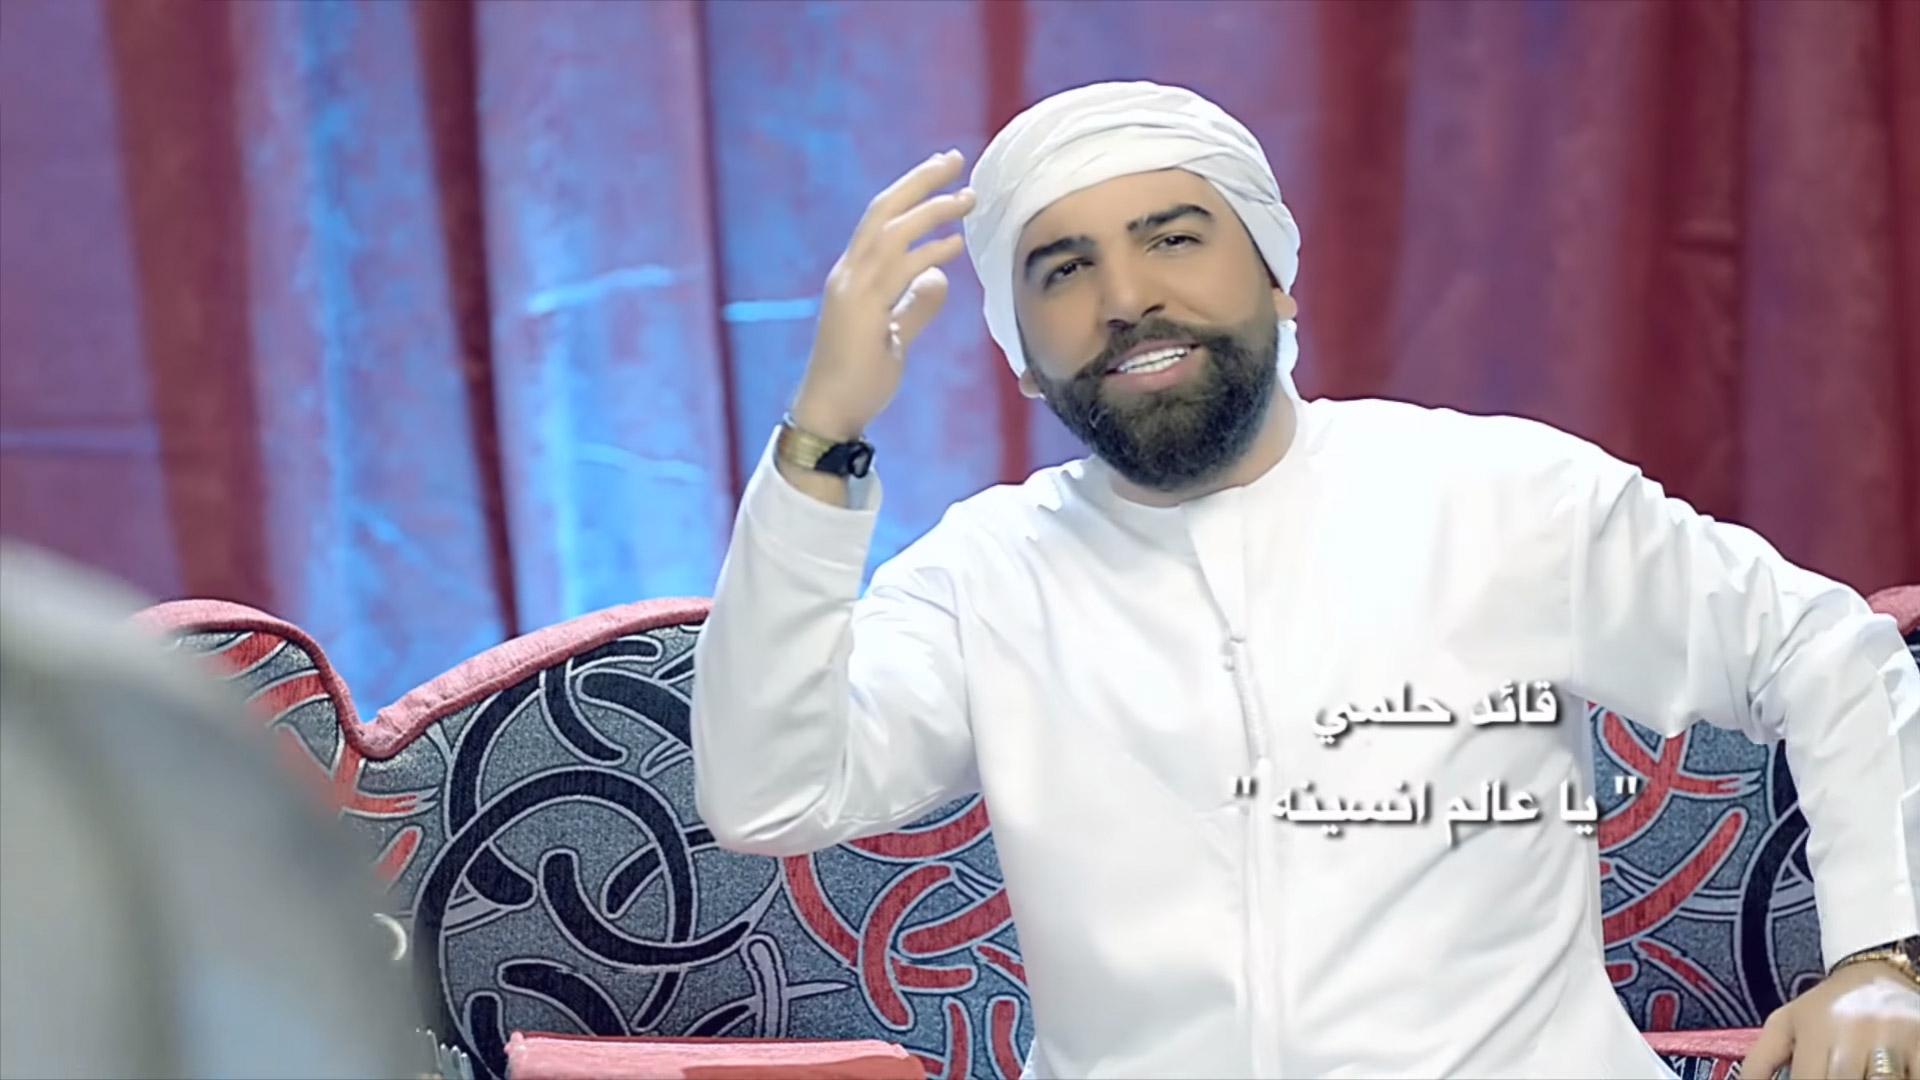 Qaed Halme - Yalm Ansena قائد حلمي – ياعالم انسينه